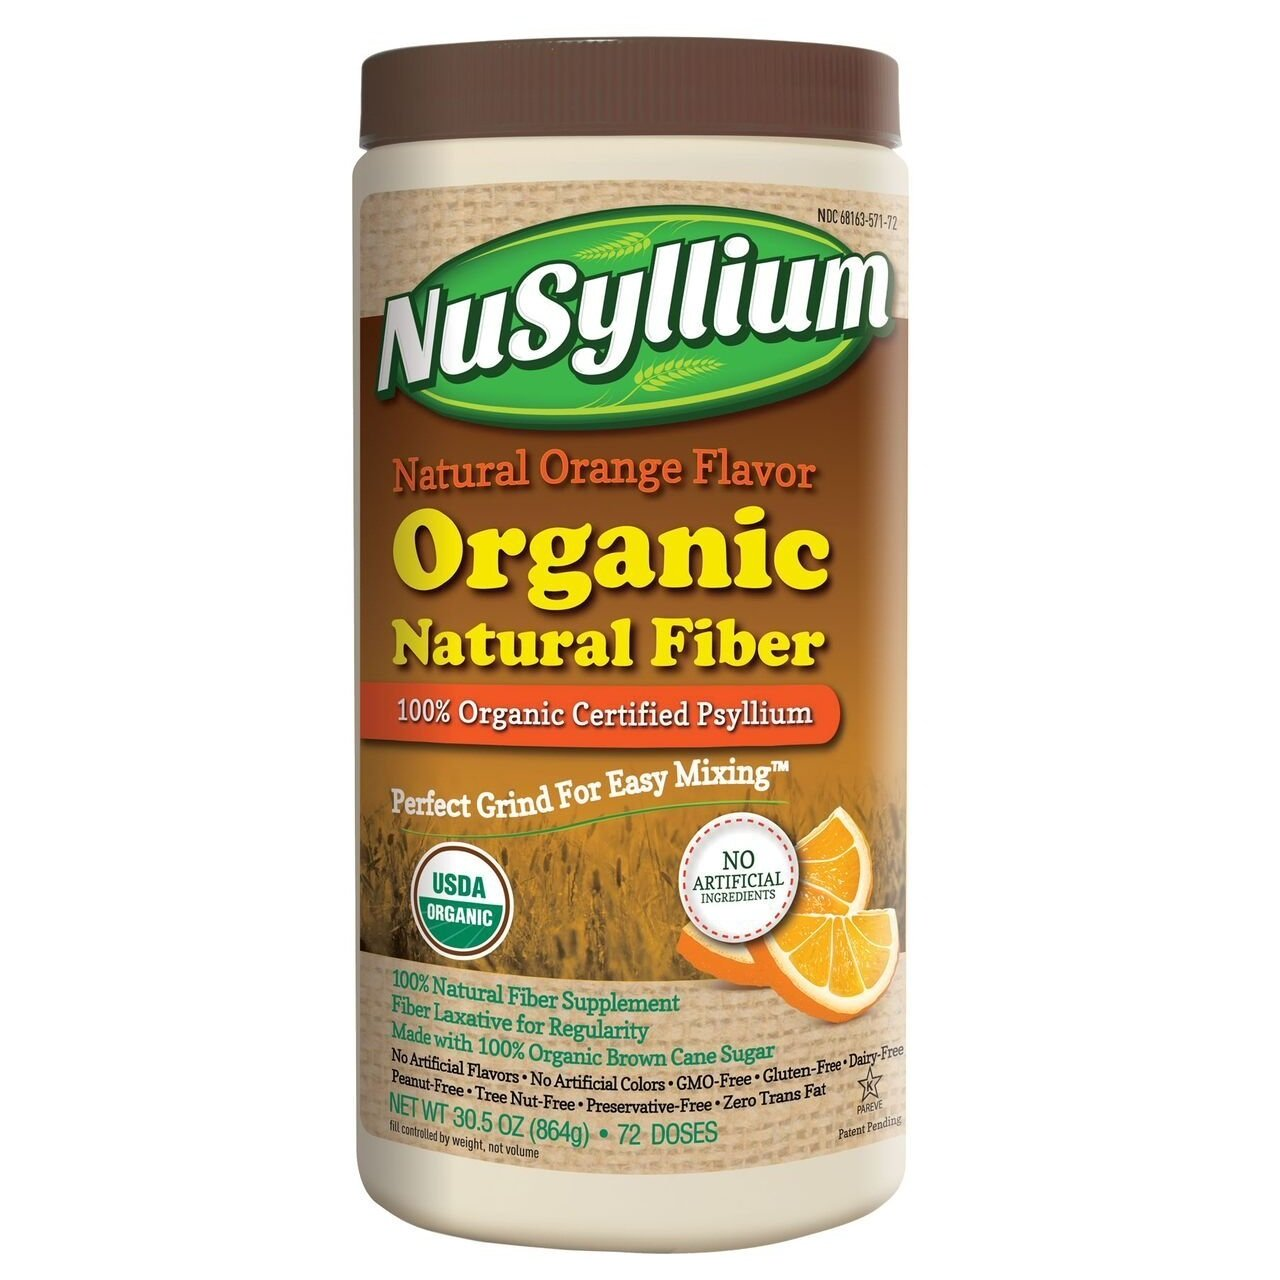 NuSyllium Orange Flavor 100% USDA Certified Organic Psyllium Husk, 72 Dose